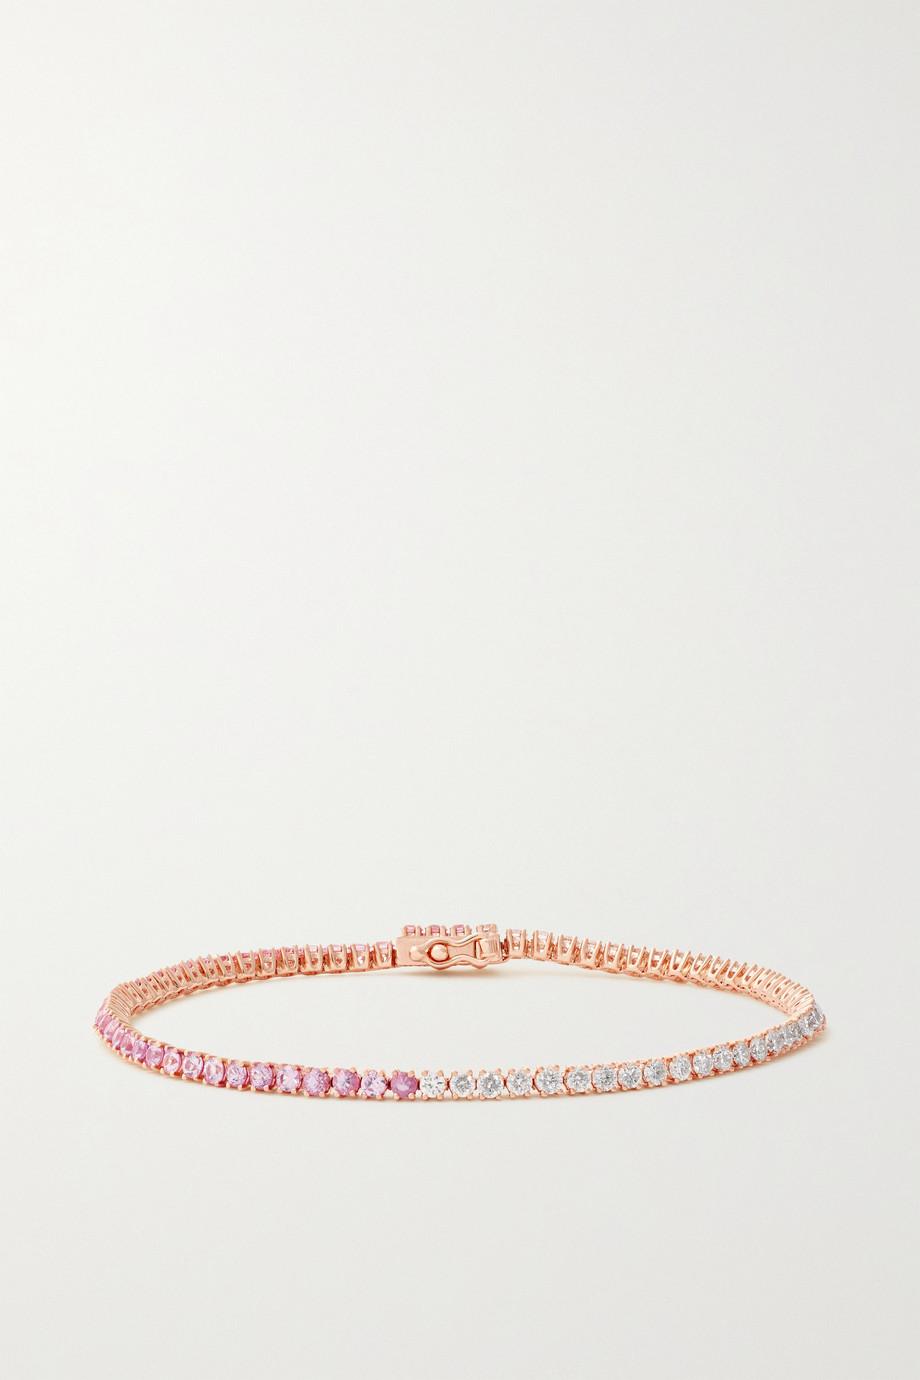 Anita Ko Hepburn 18-karat rose gold, sapphire and diamond bracelet